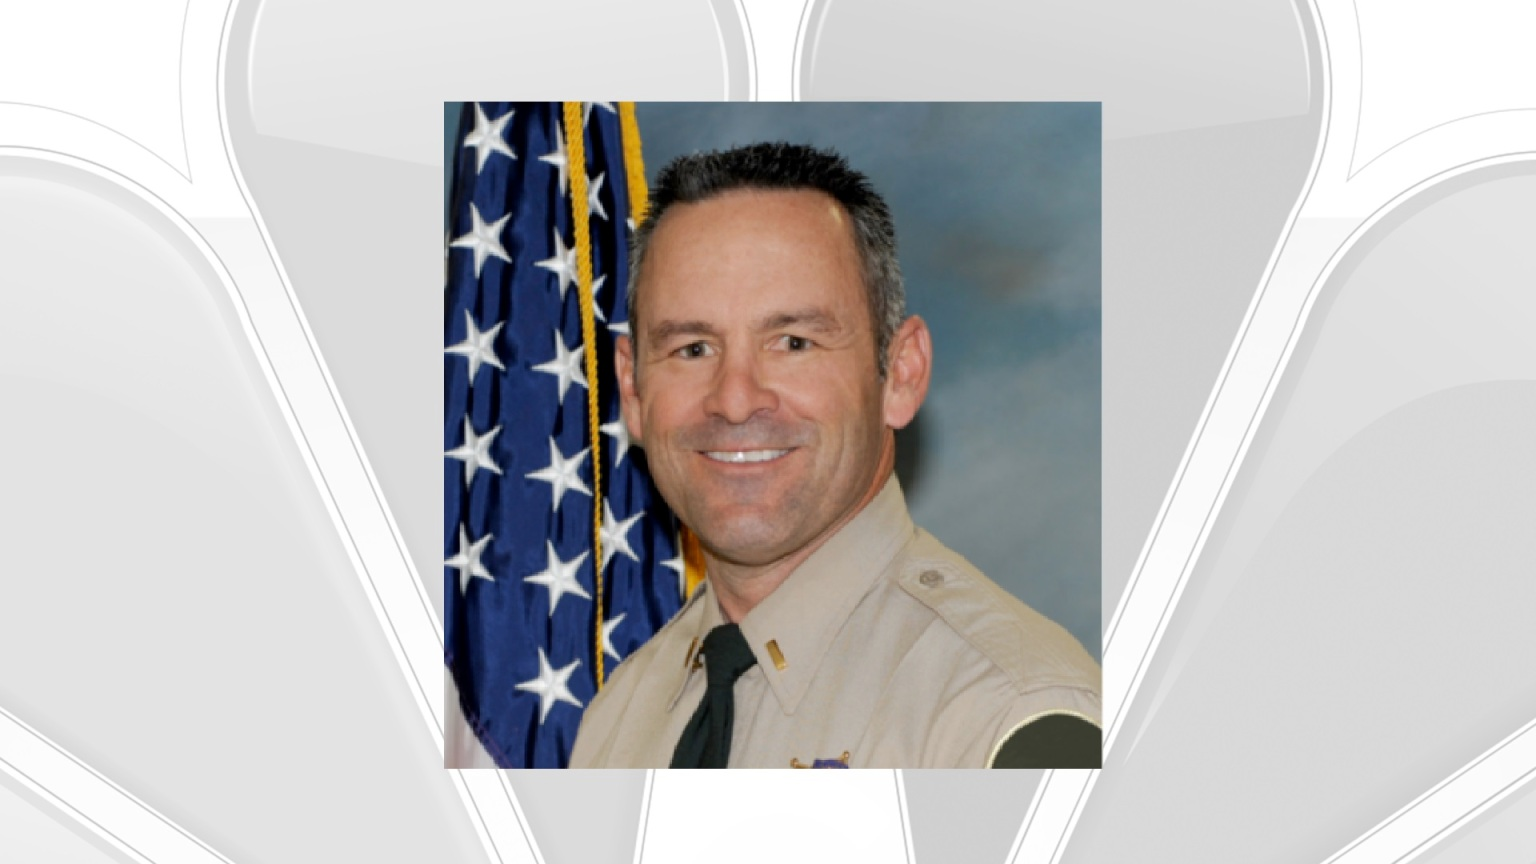 Riverside County Sheriff to Spend $72K on Social Media Annually